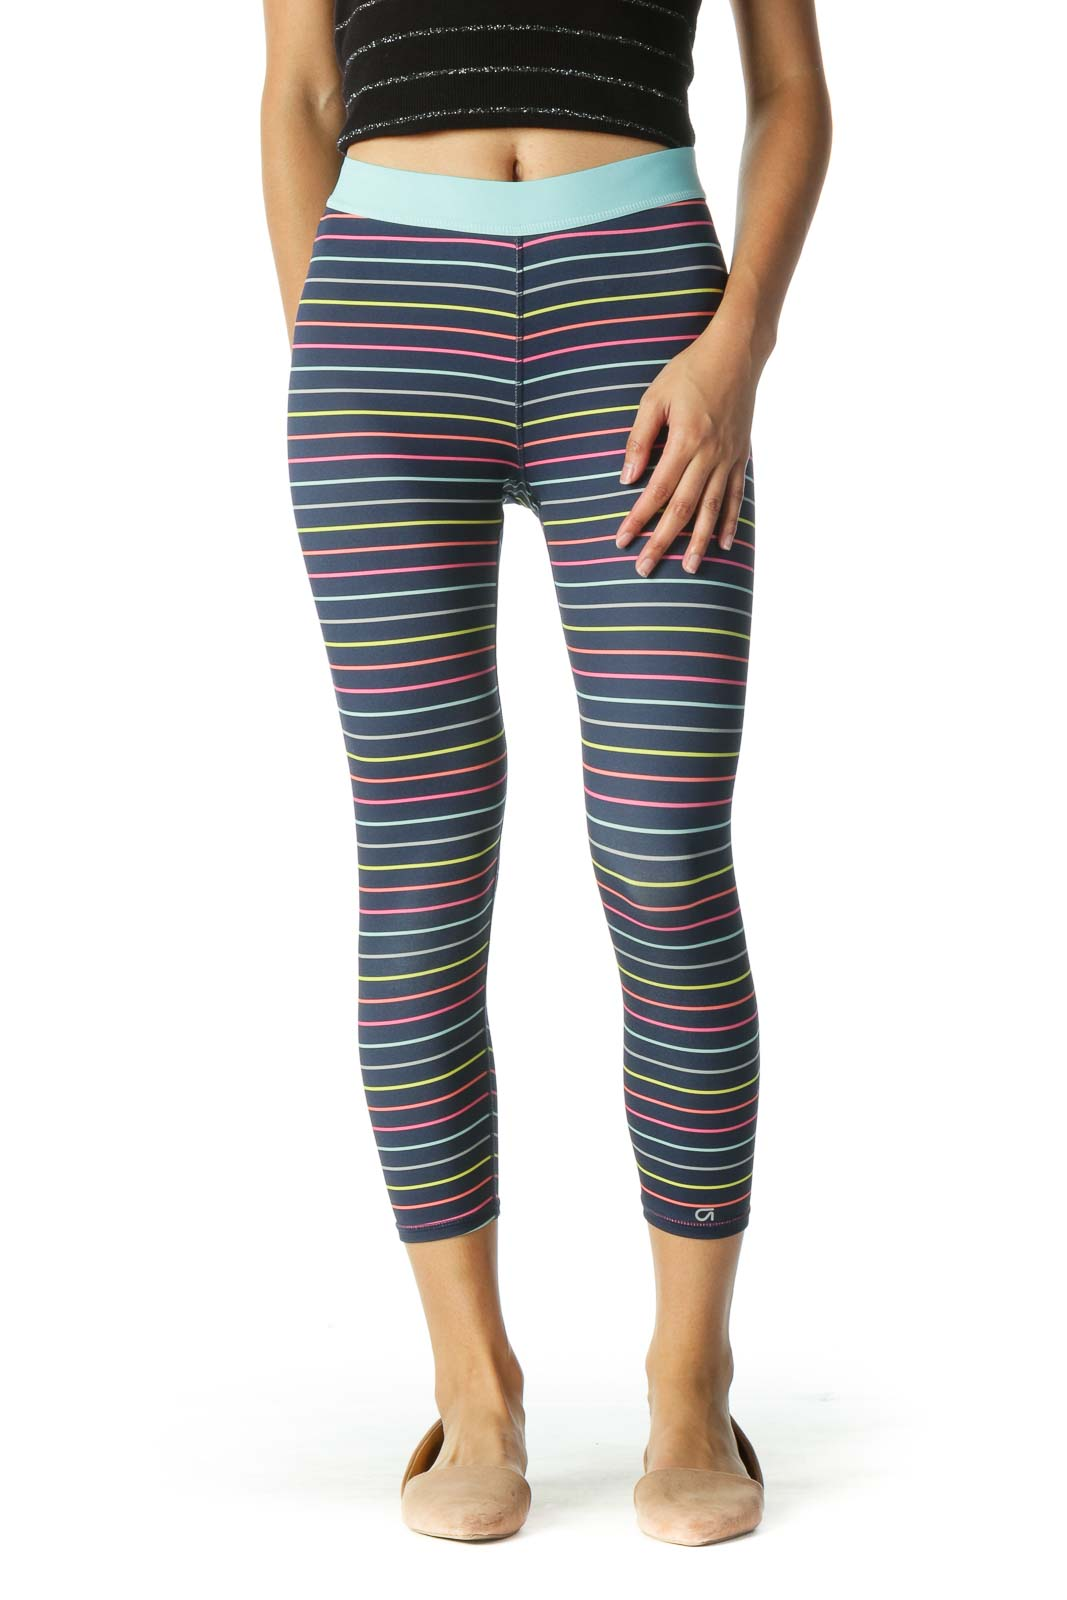 Blue Multicolor Striped Leggings Front